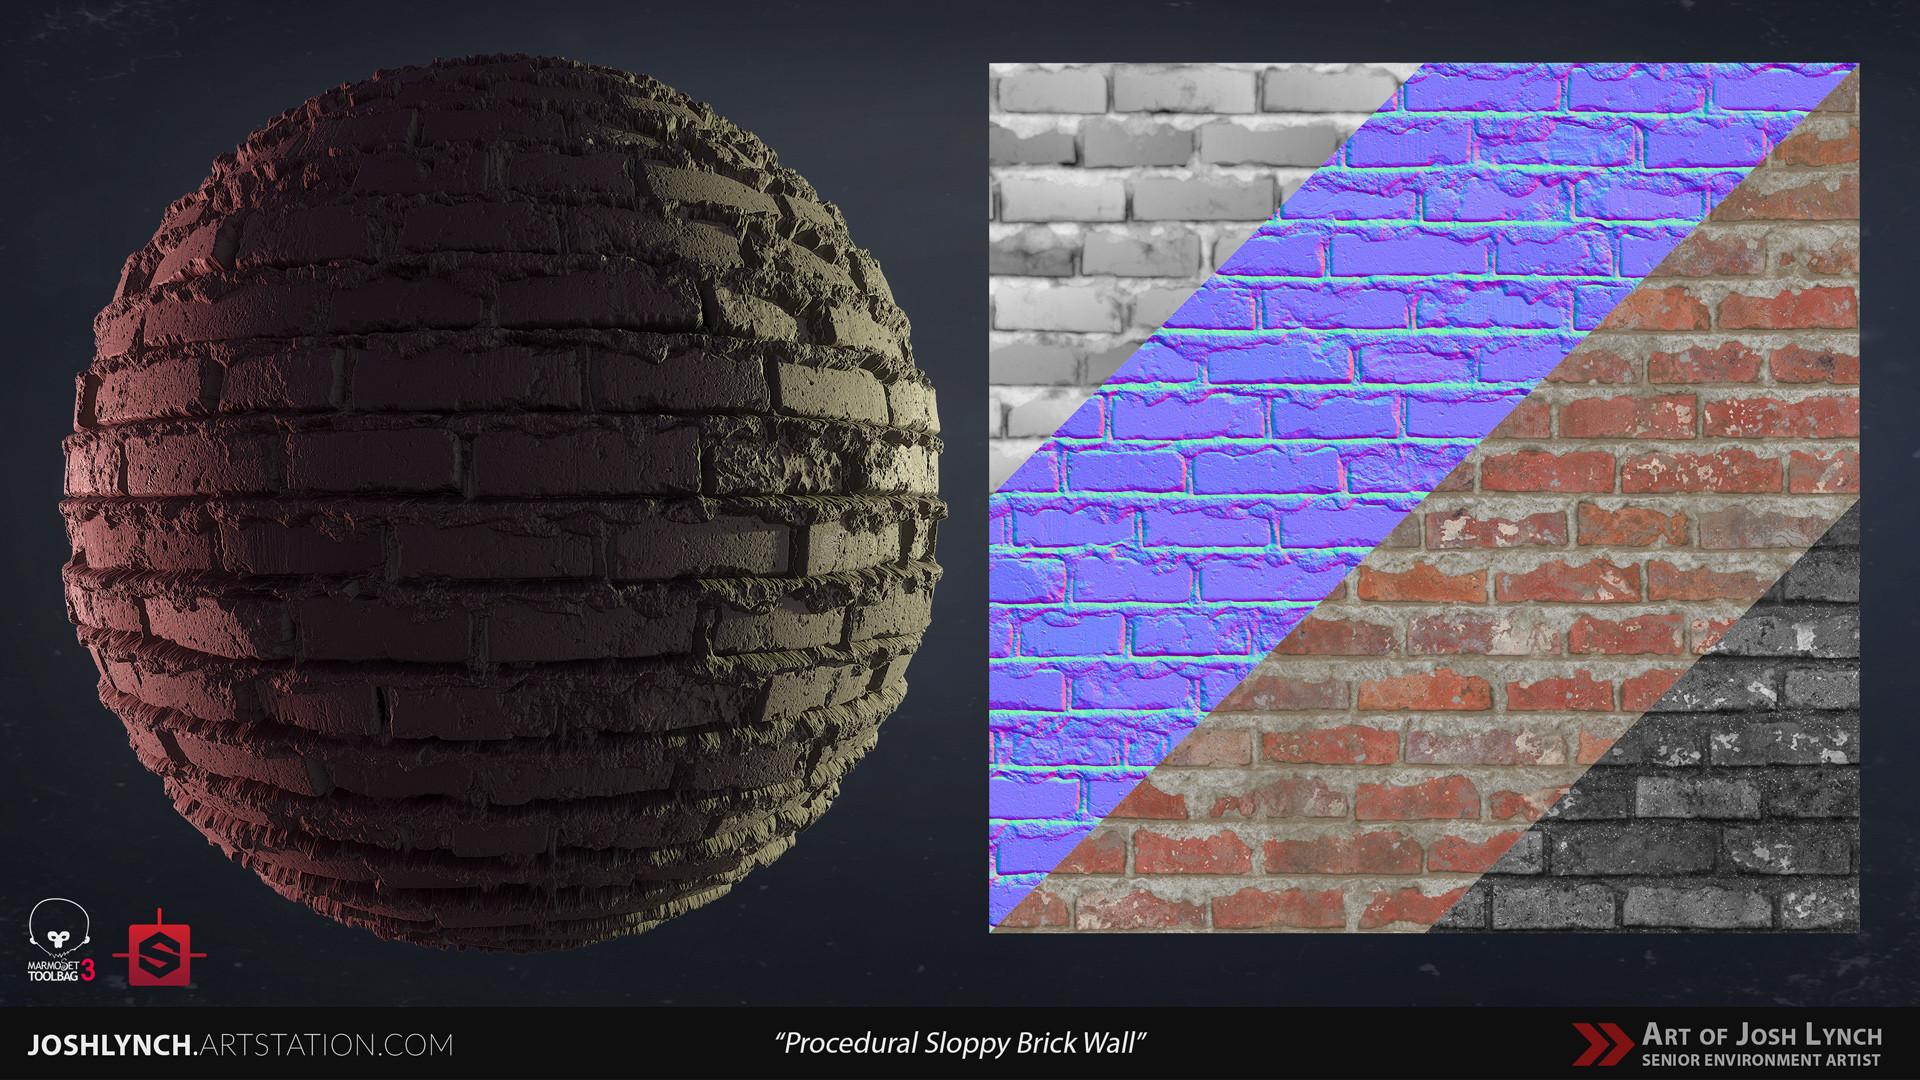 Joshua lynch wall brick sloppy 02 comp sphere 04 gray